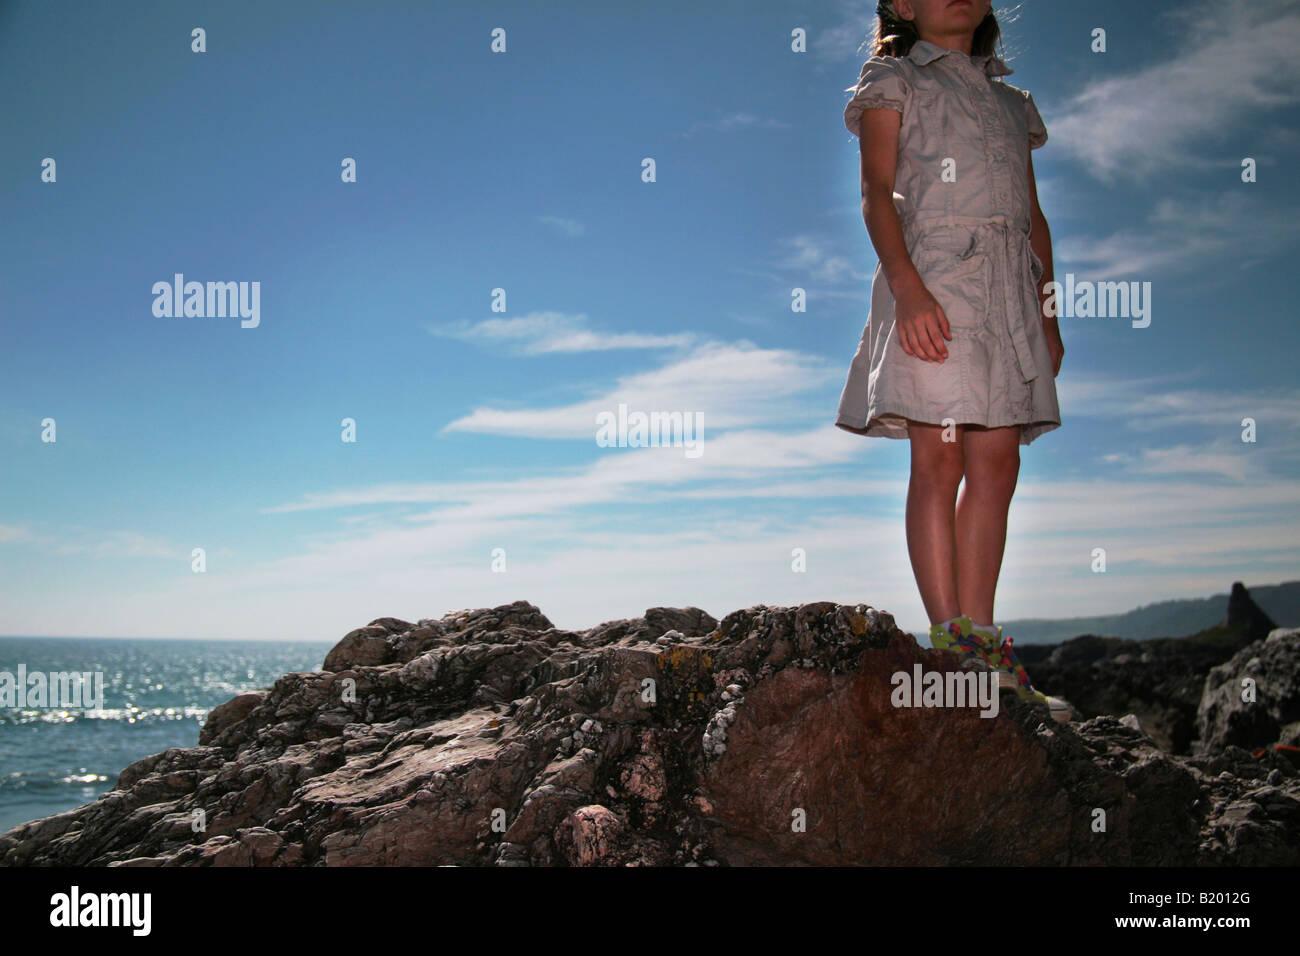 young girl stood on rocks - Stock Image